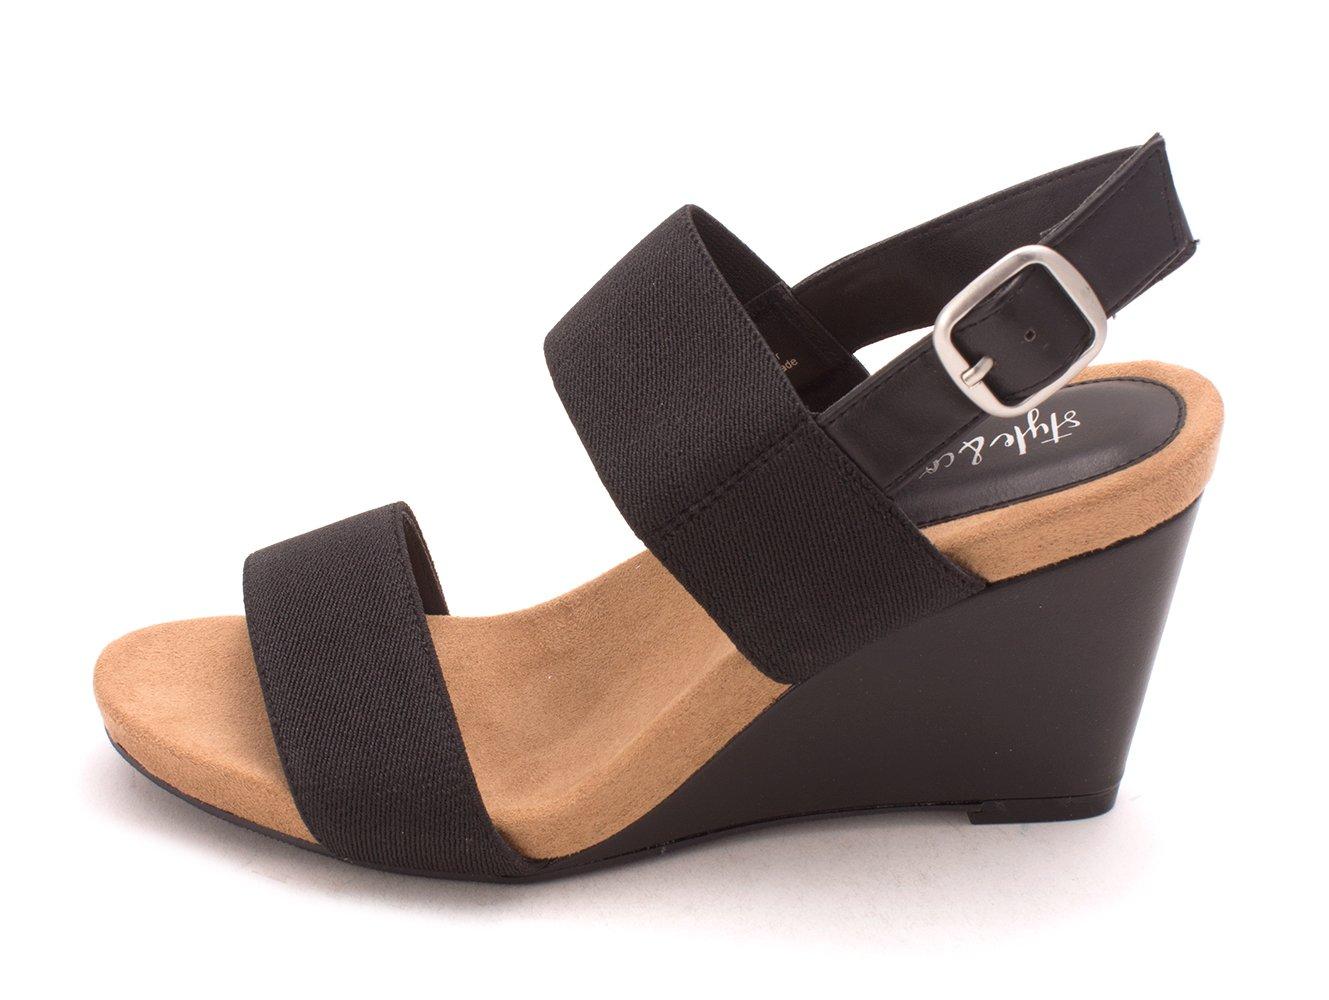 Style & Co. Womens Fillipi Open Toe Casual Platform Sandals, Black, Size 9.0